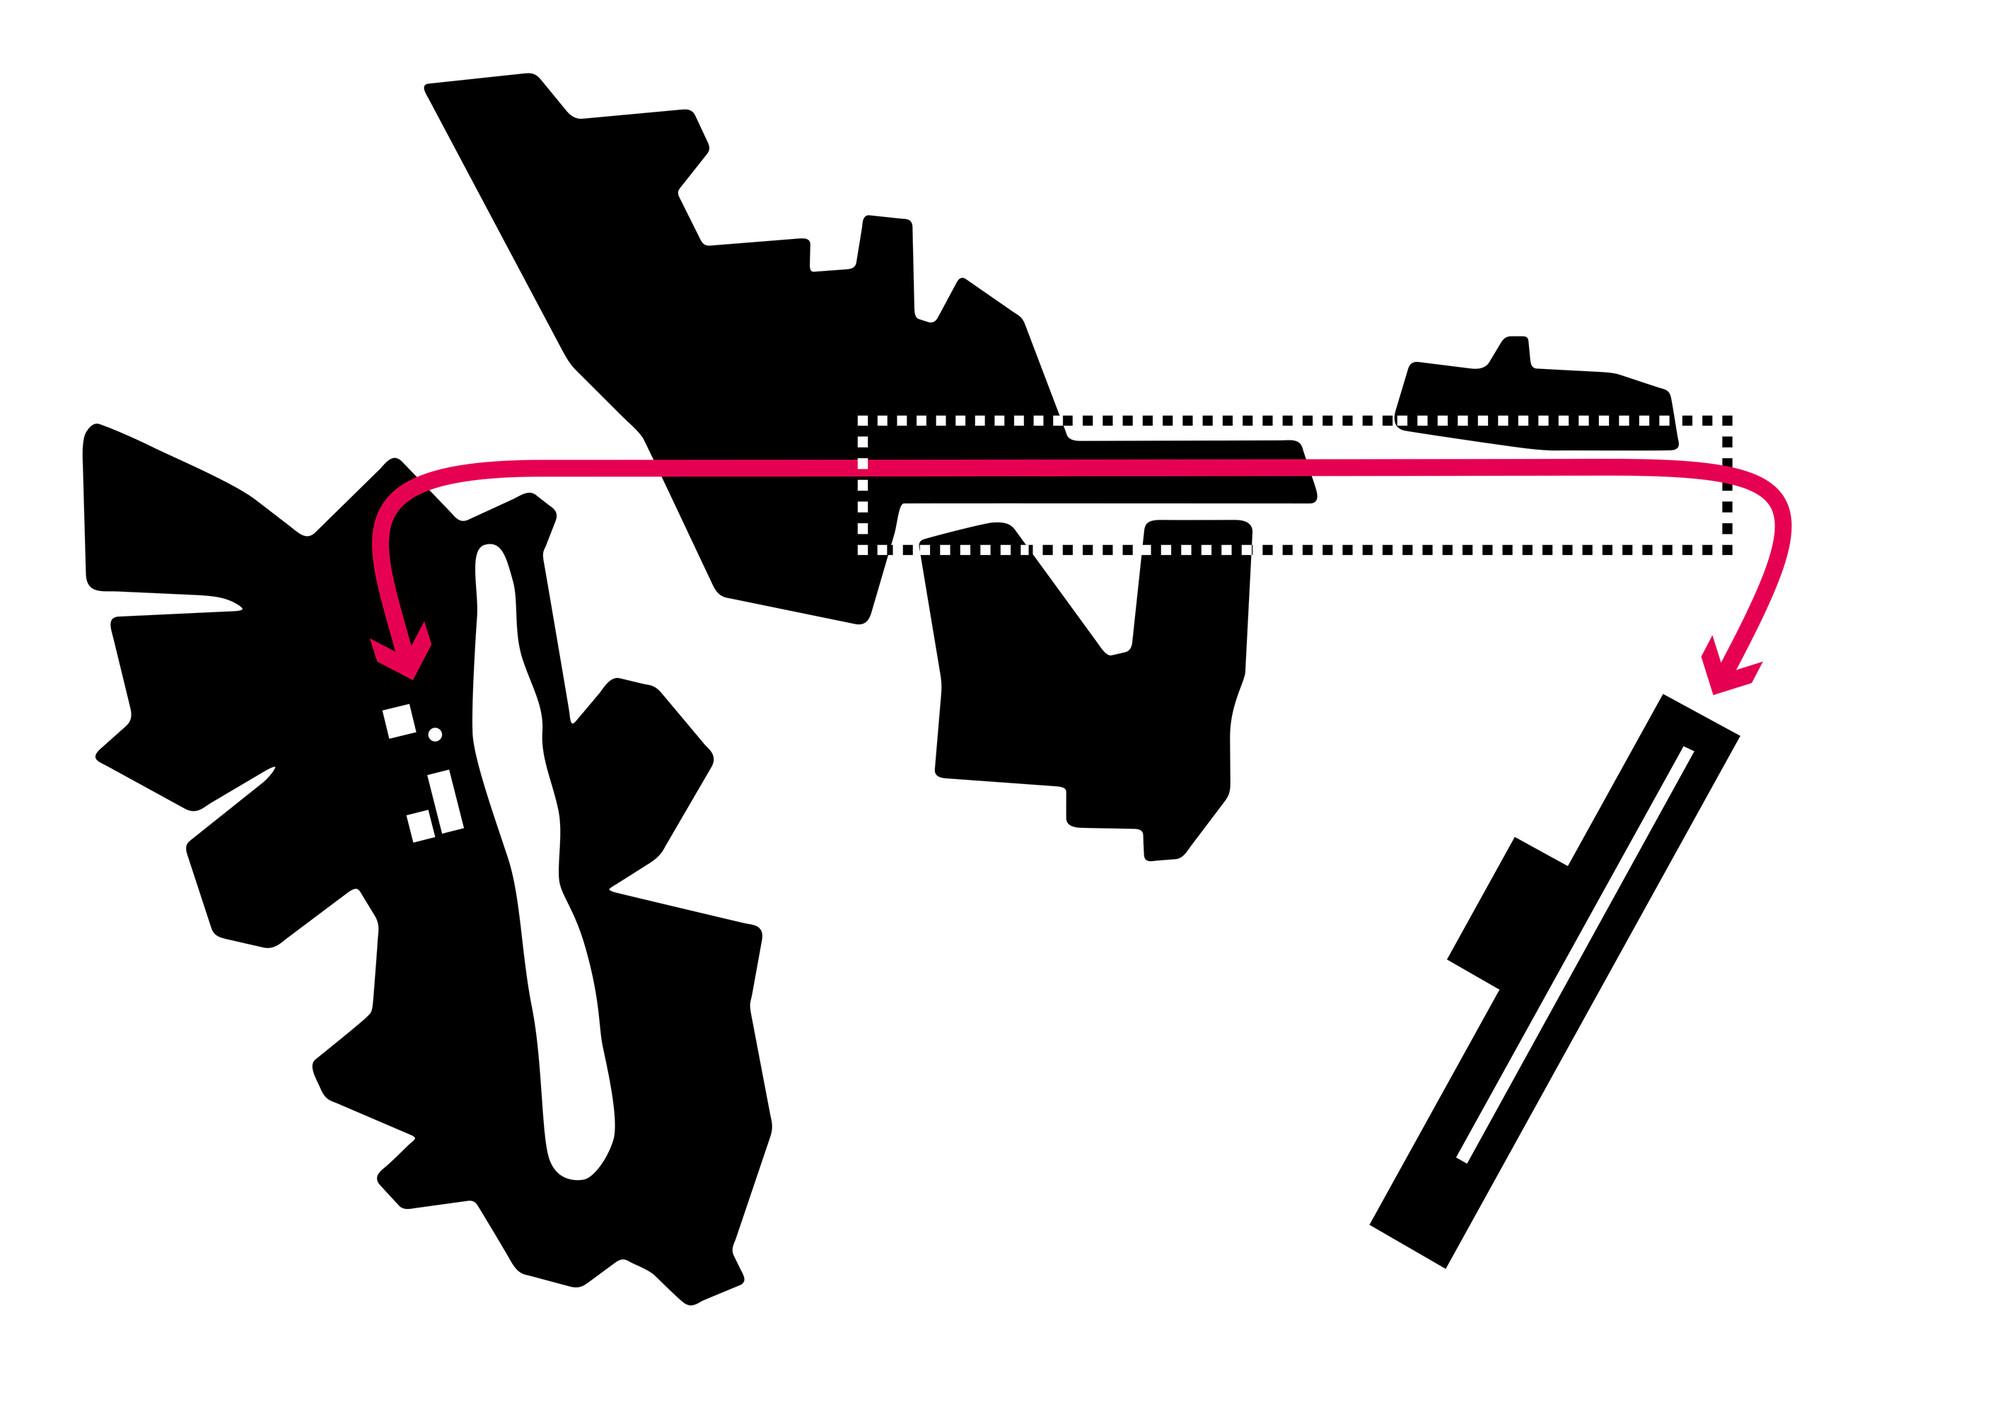 concept localization diagram